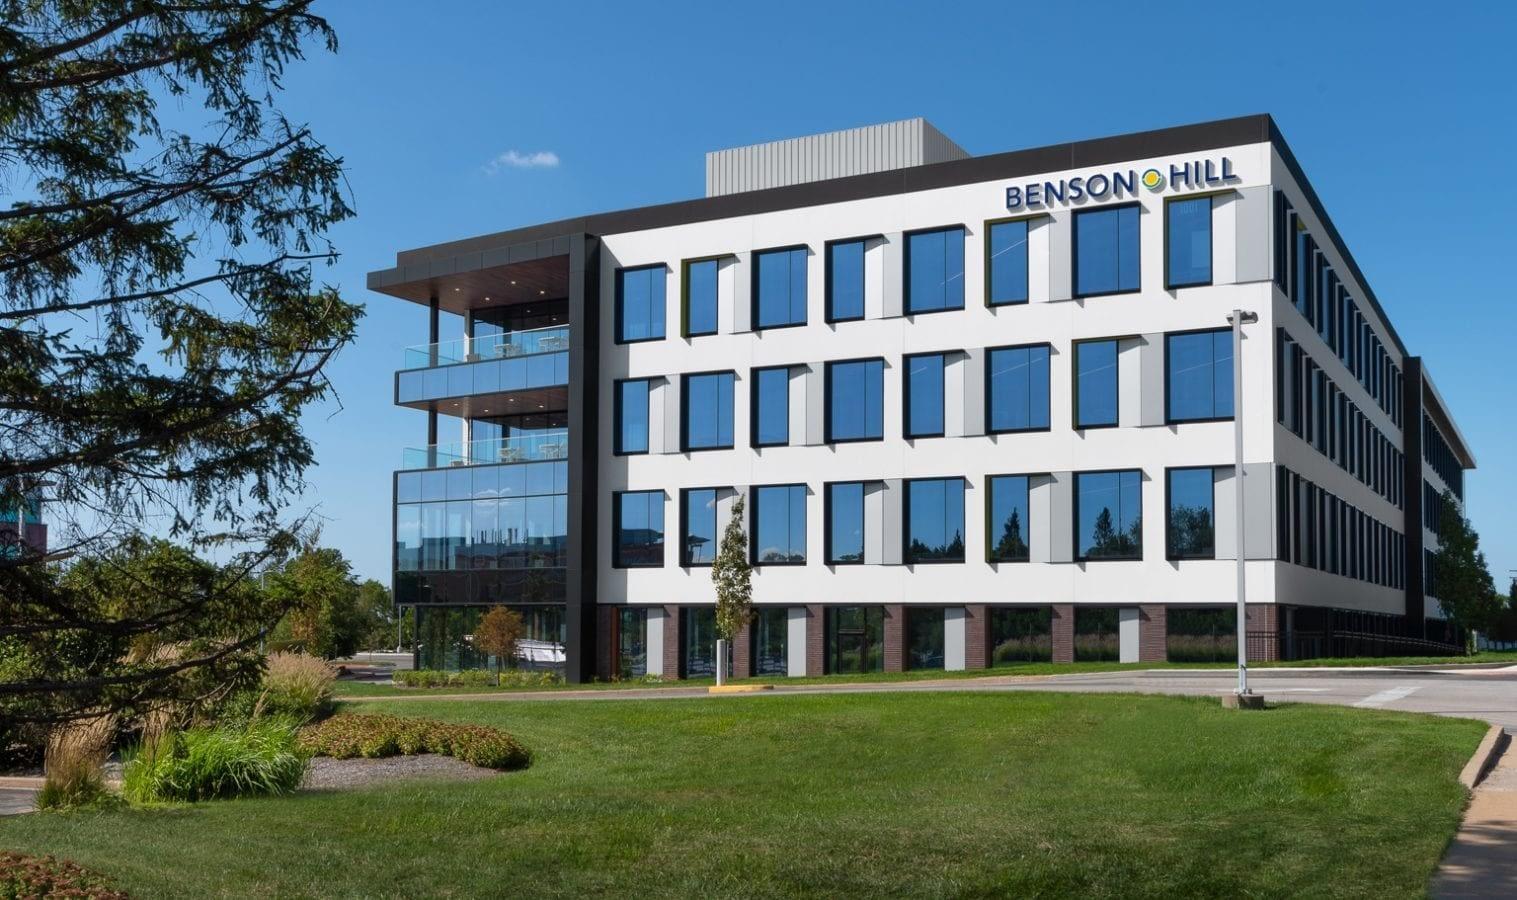 Alternative protein companies Oatly, Benson Hill initiate plans to go publicAlternative protein companies Oatly, Benson Hill initiate plans to go public